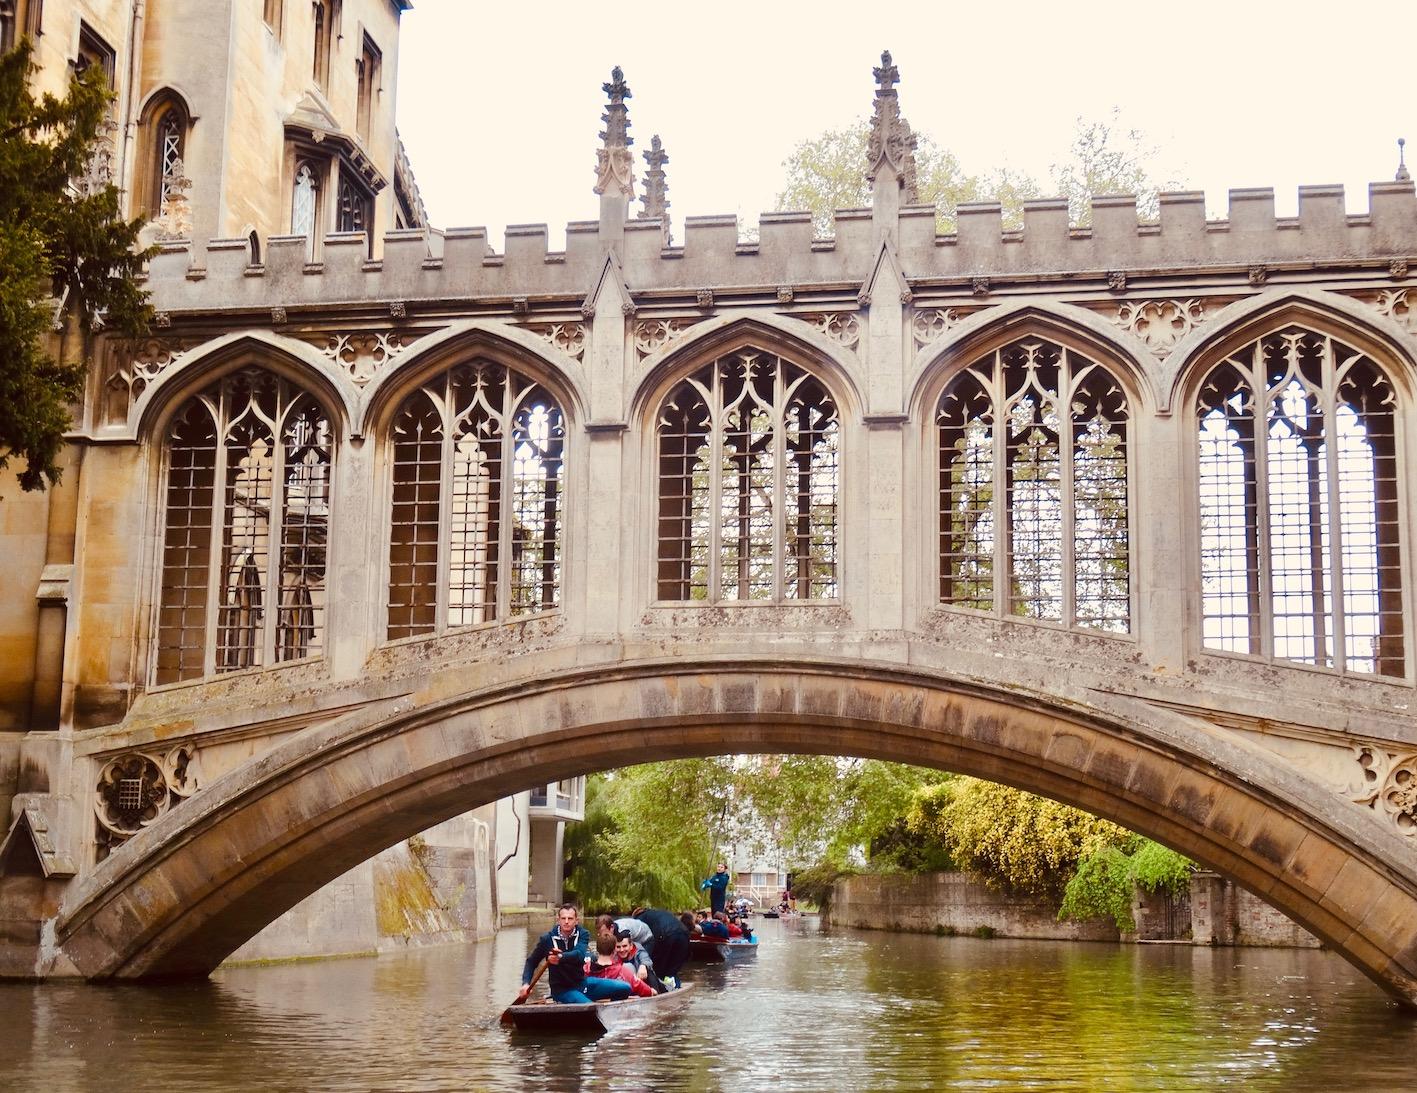 The Bridge of Sighs Cambridge England.